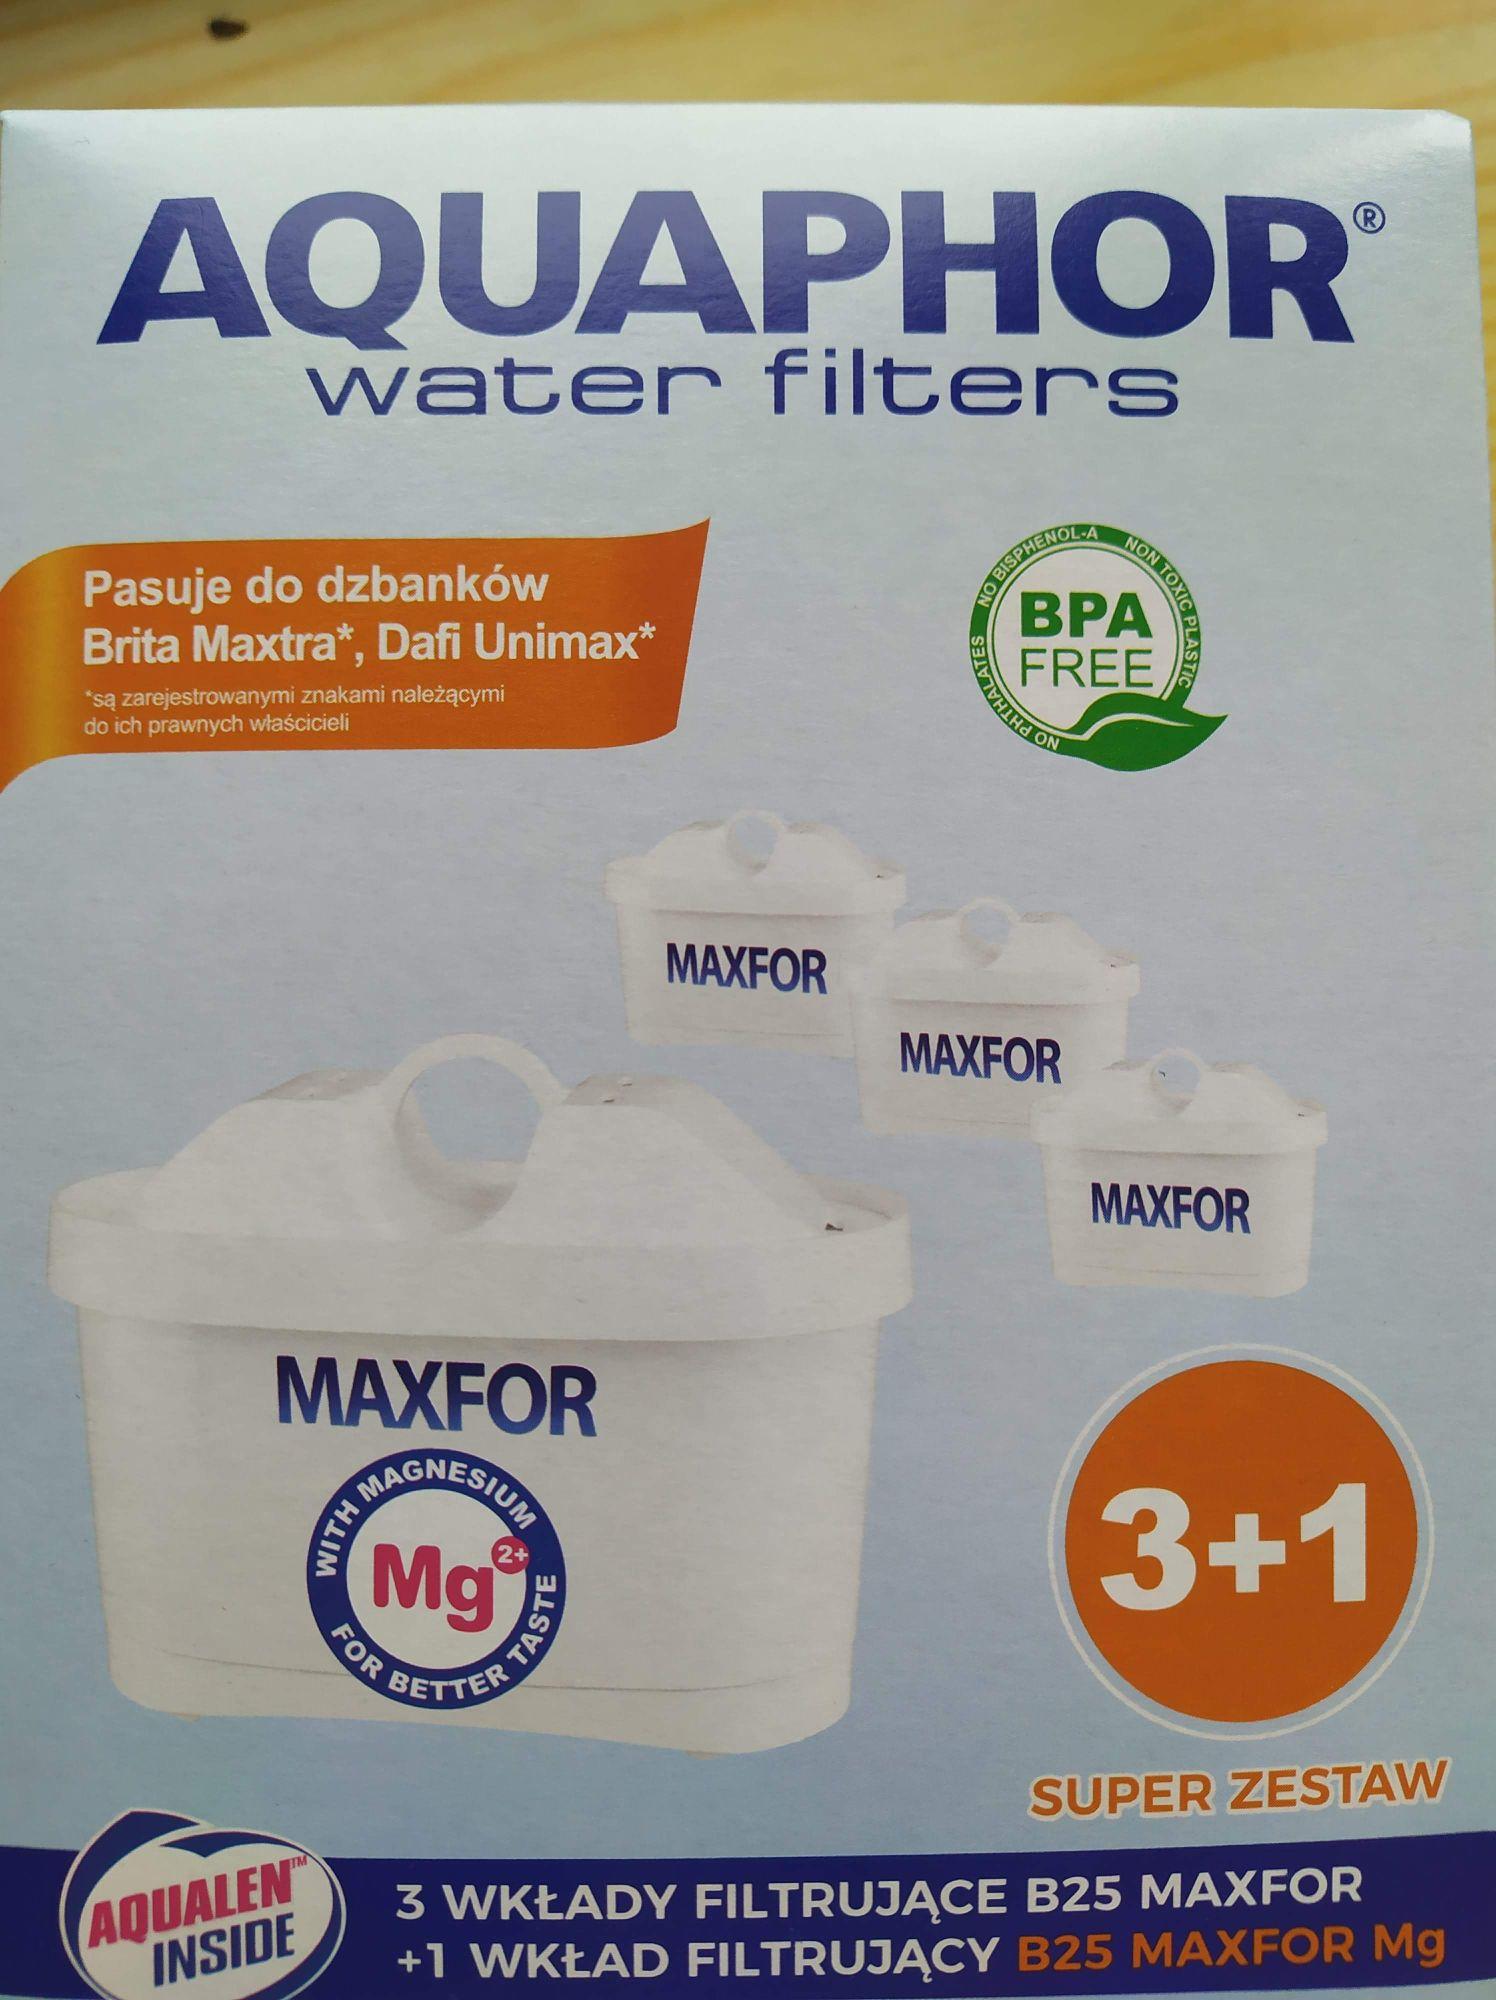 Biedronka - 8 filtrów Aquaphor Maxfor B25